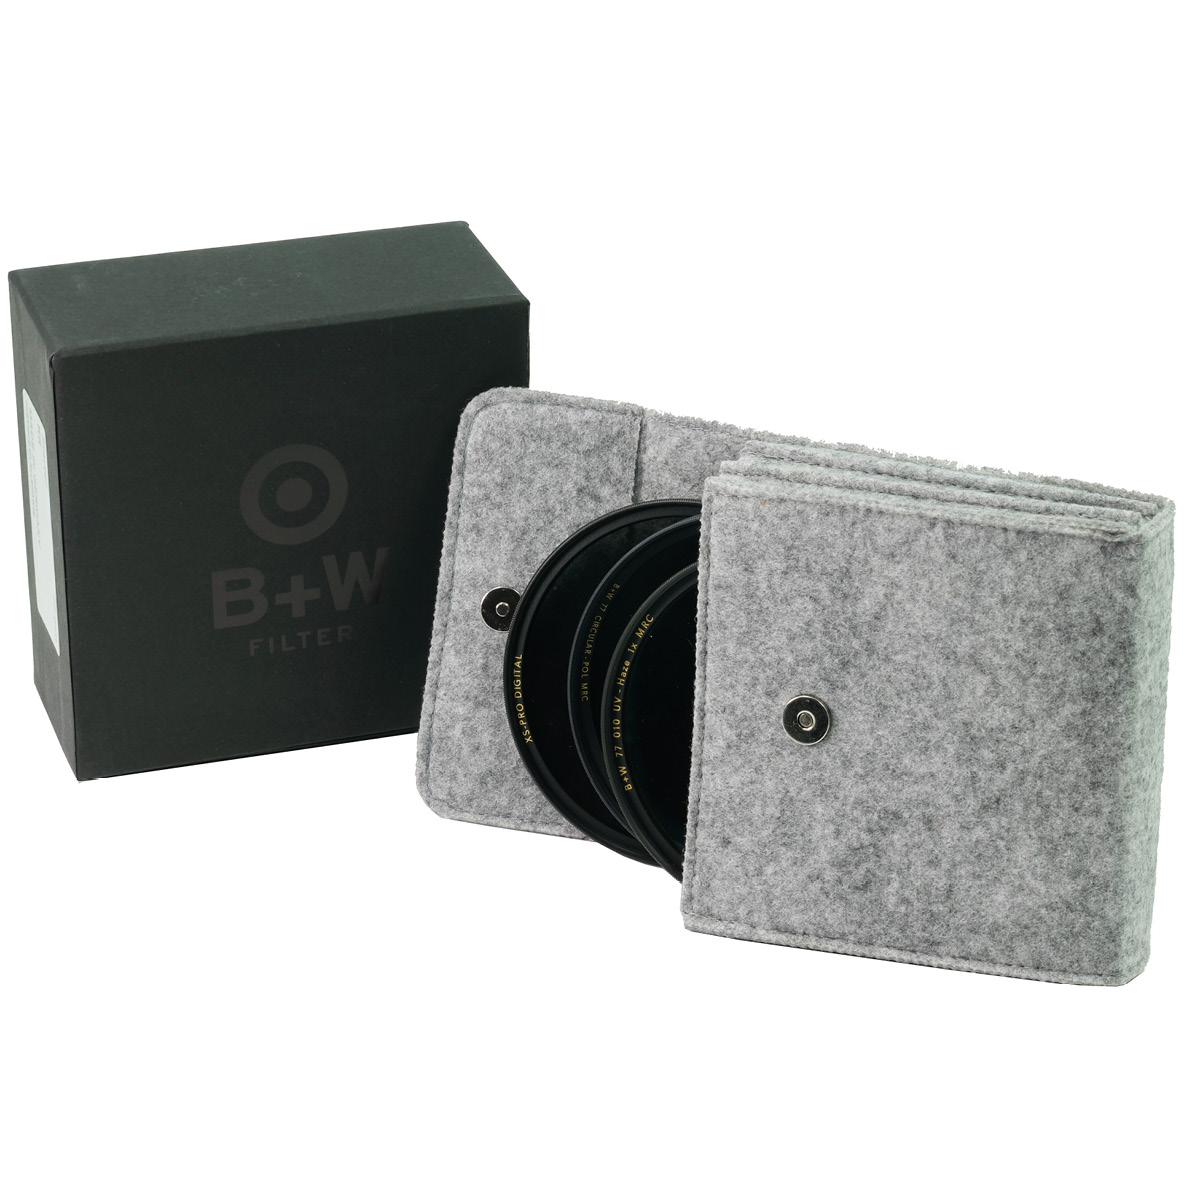 B+W Creative Starter Kit 82 mm